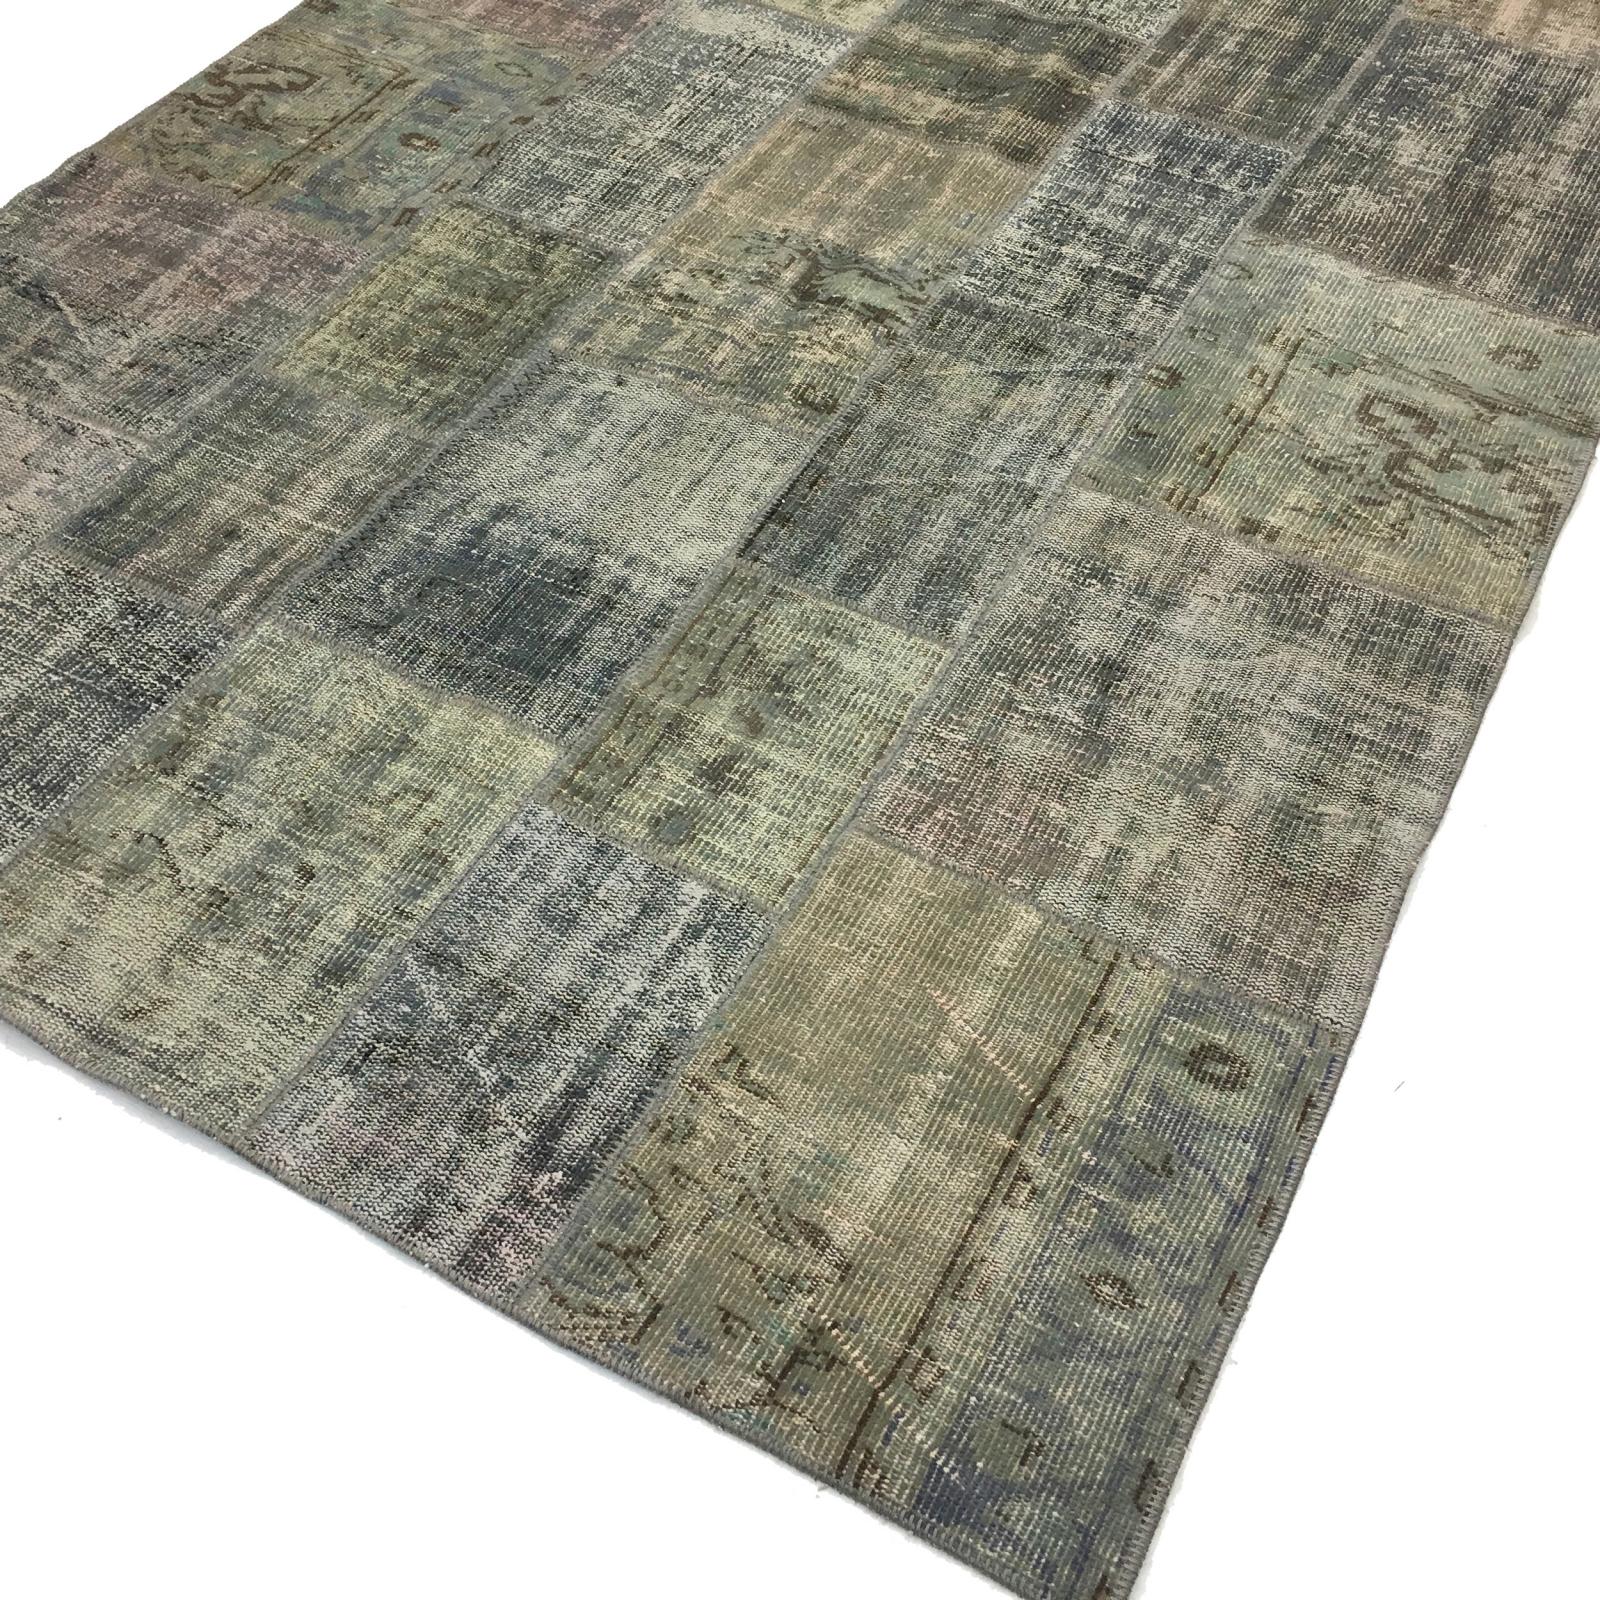 grau vintage patchwork teppich 200x298cm. Black Bedroom Furniture Sets. Home Design Ideas